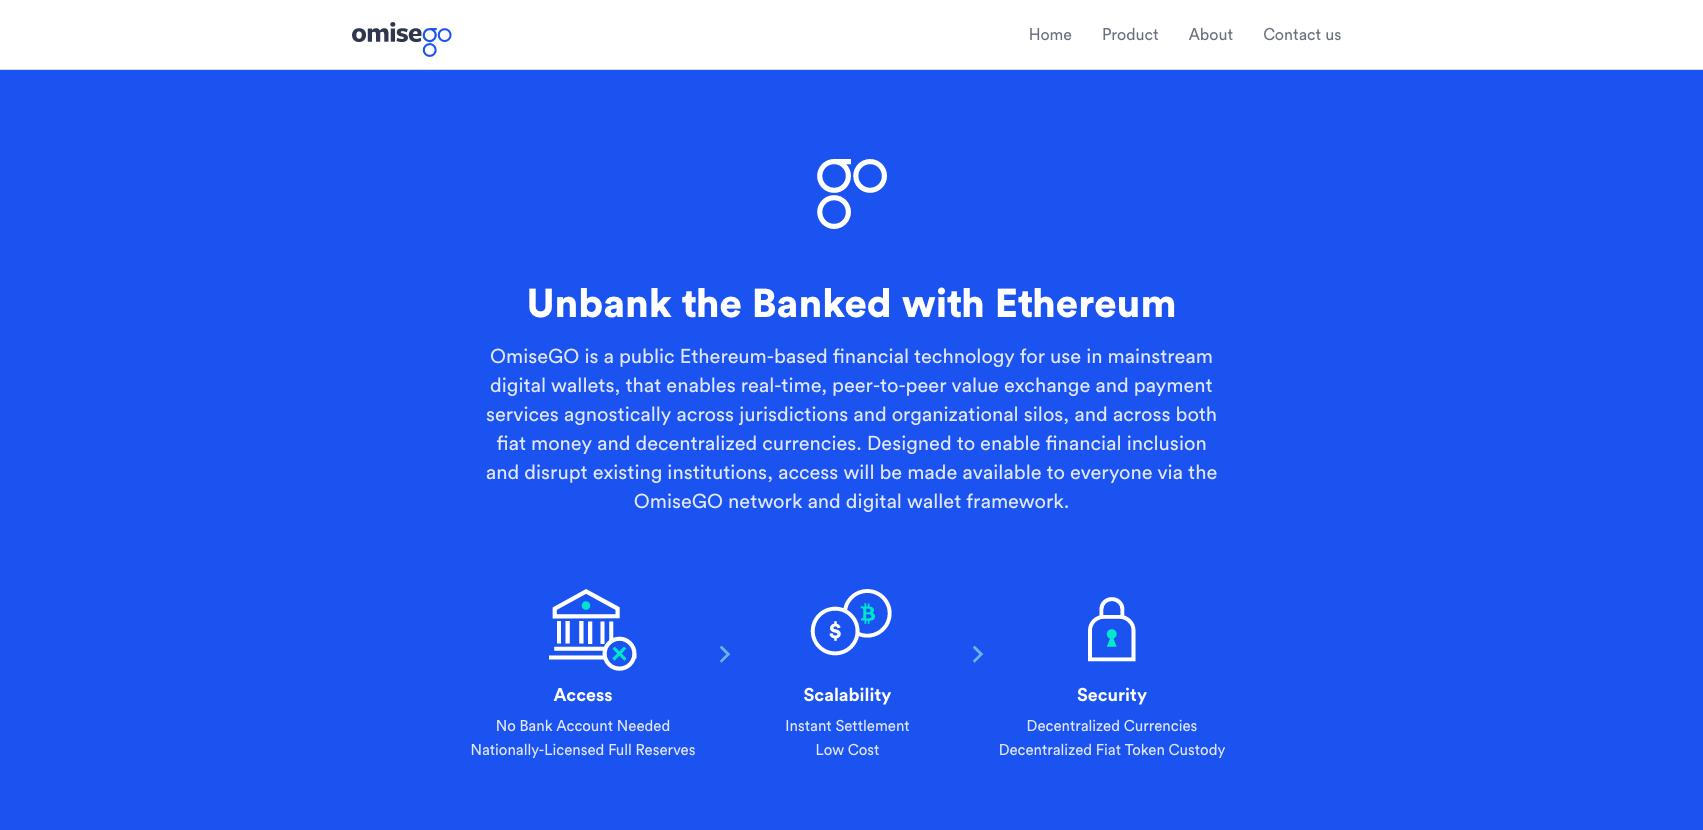 omisego-website